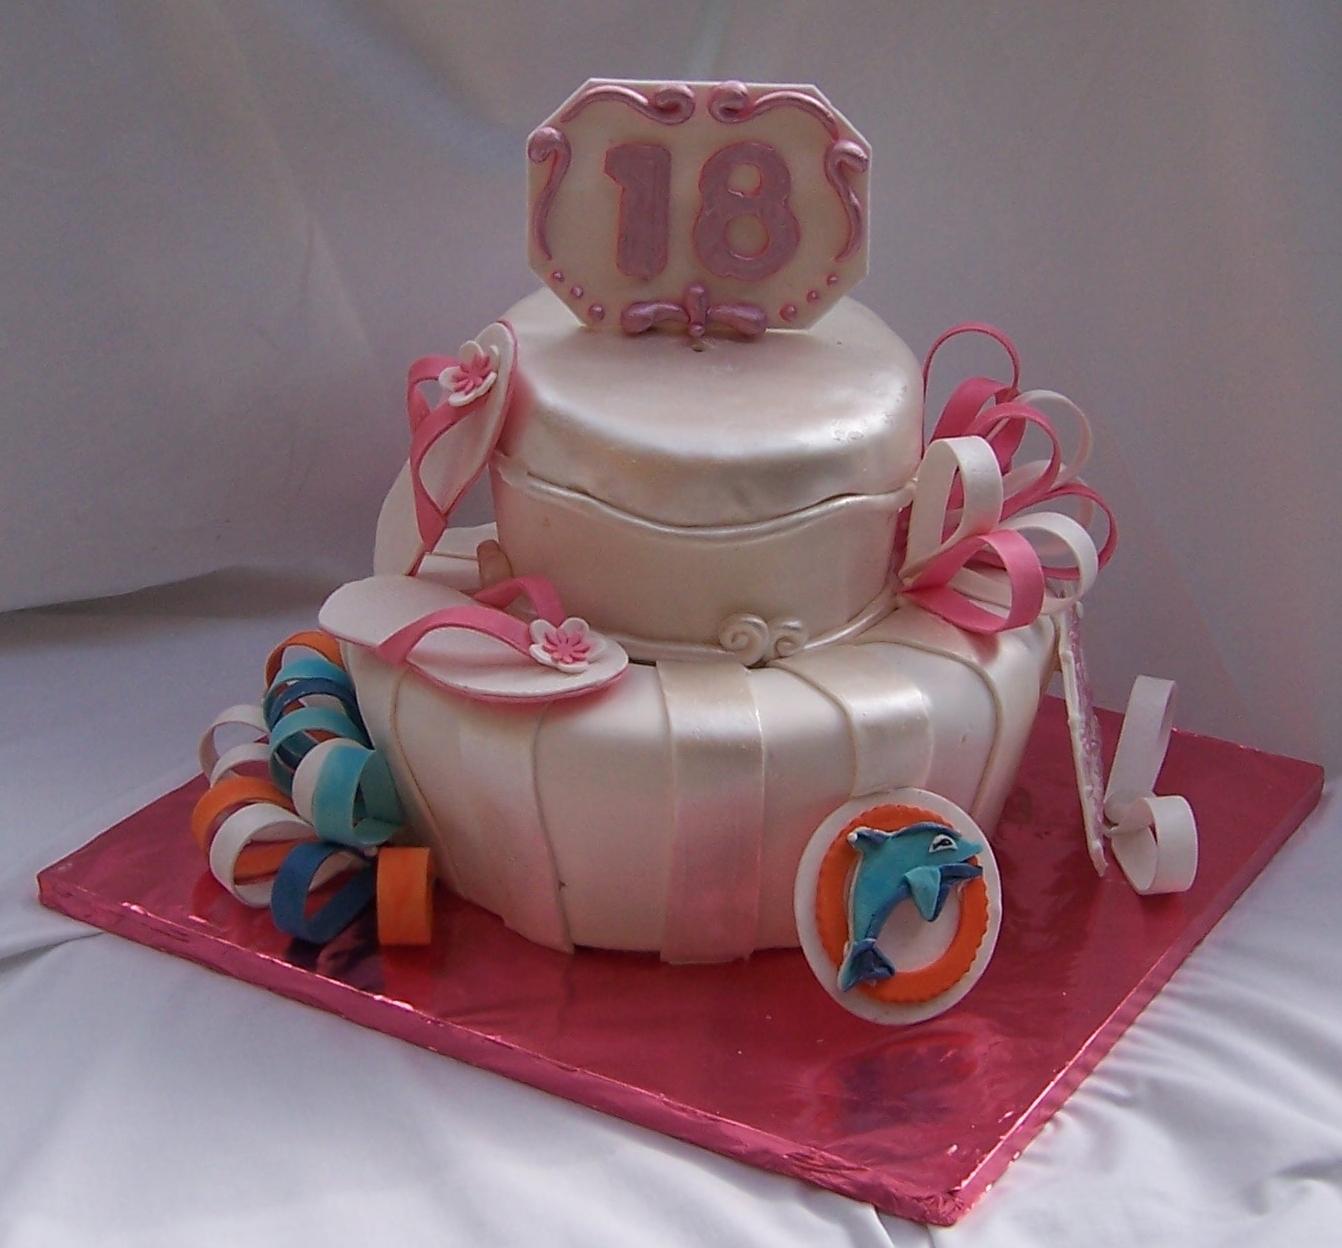 Miami Dolphins Cheerleader Birthday Cake For Samantha